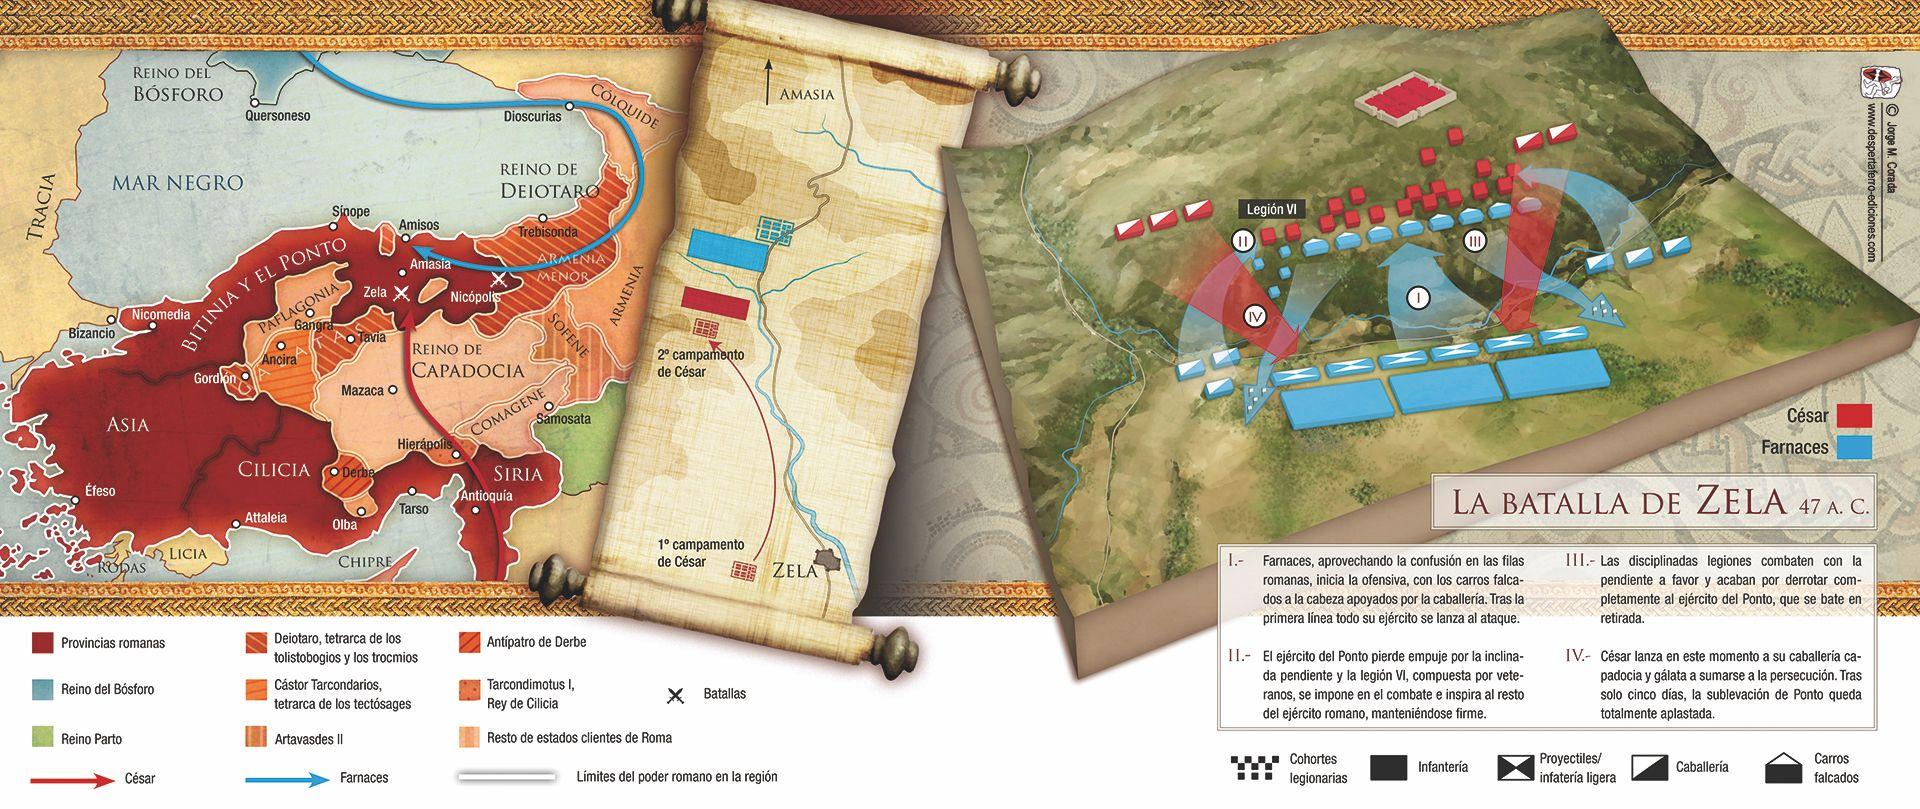 Mapa batalla de Zela Julio César